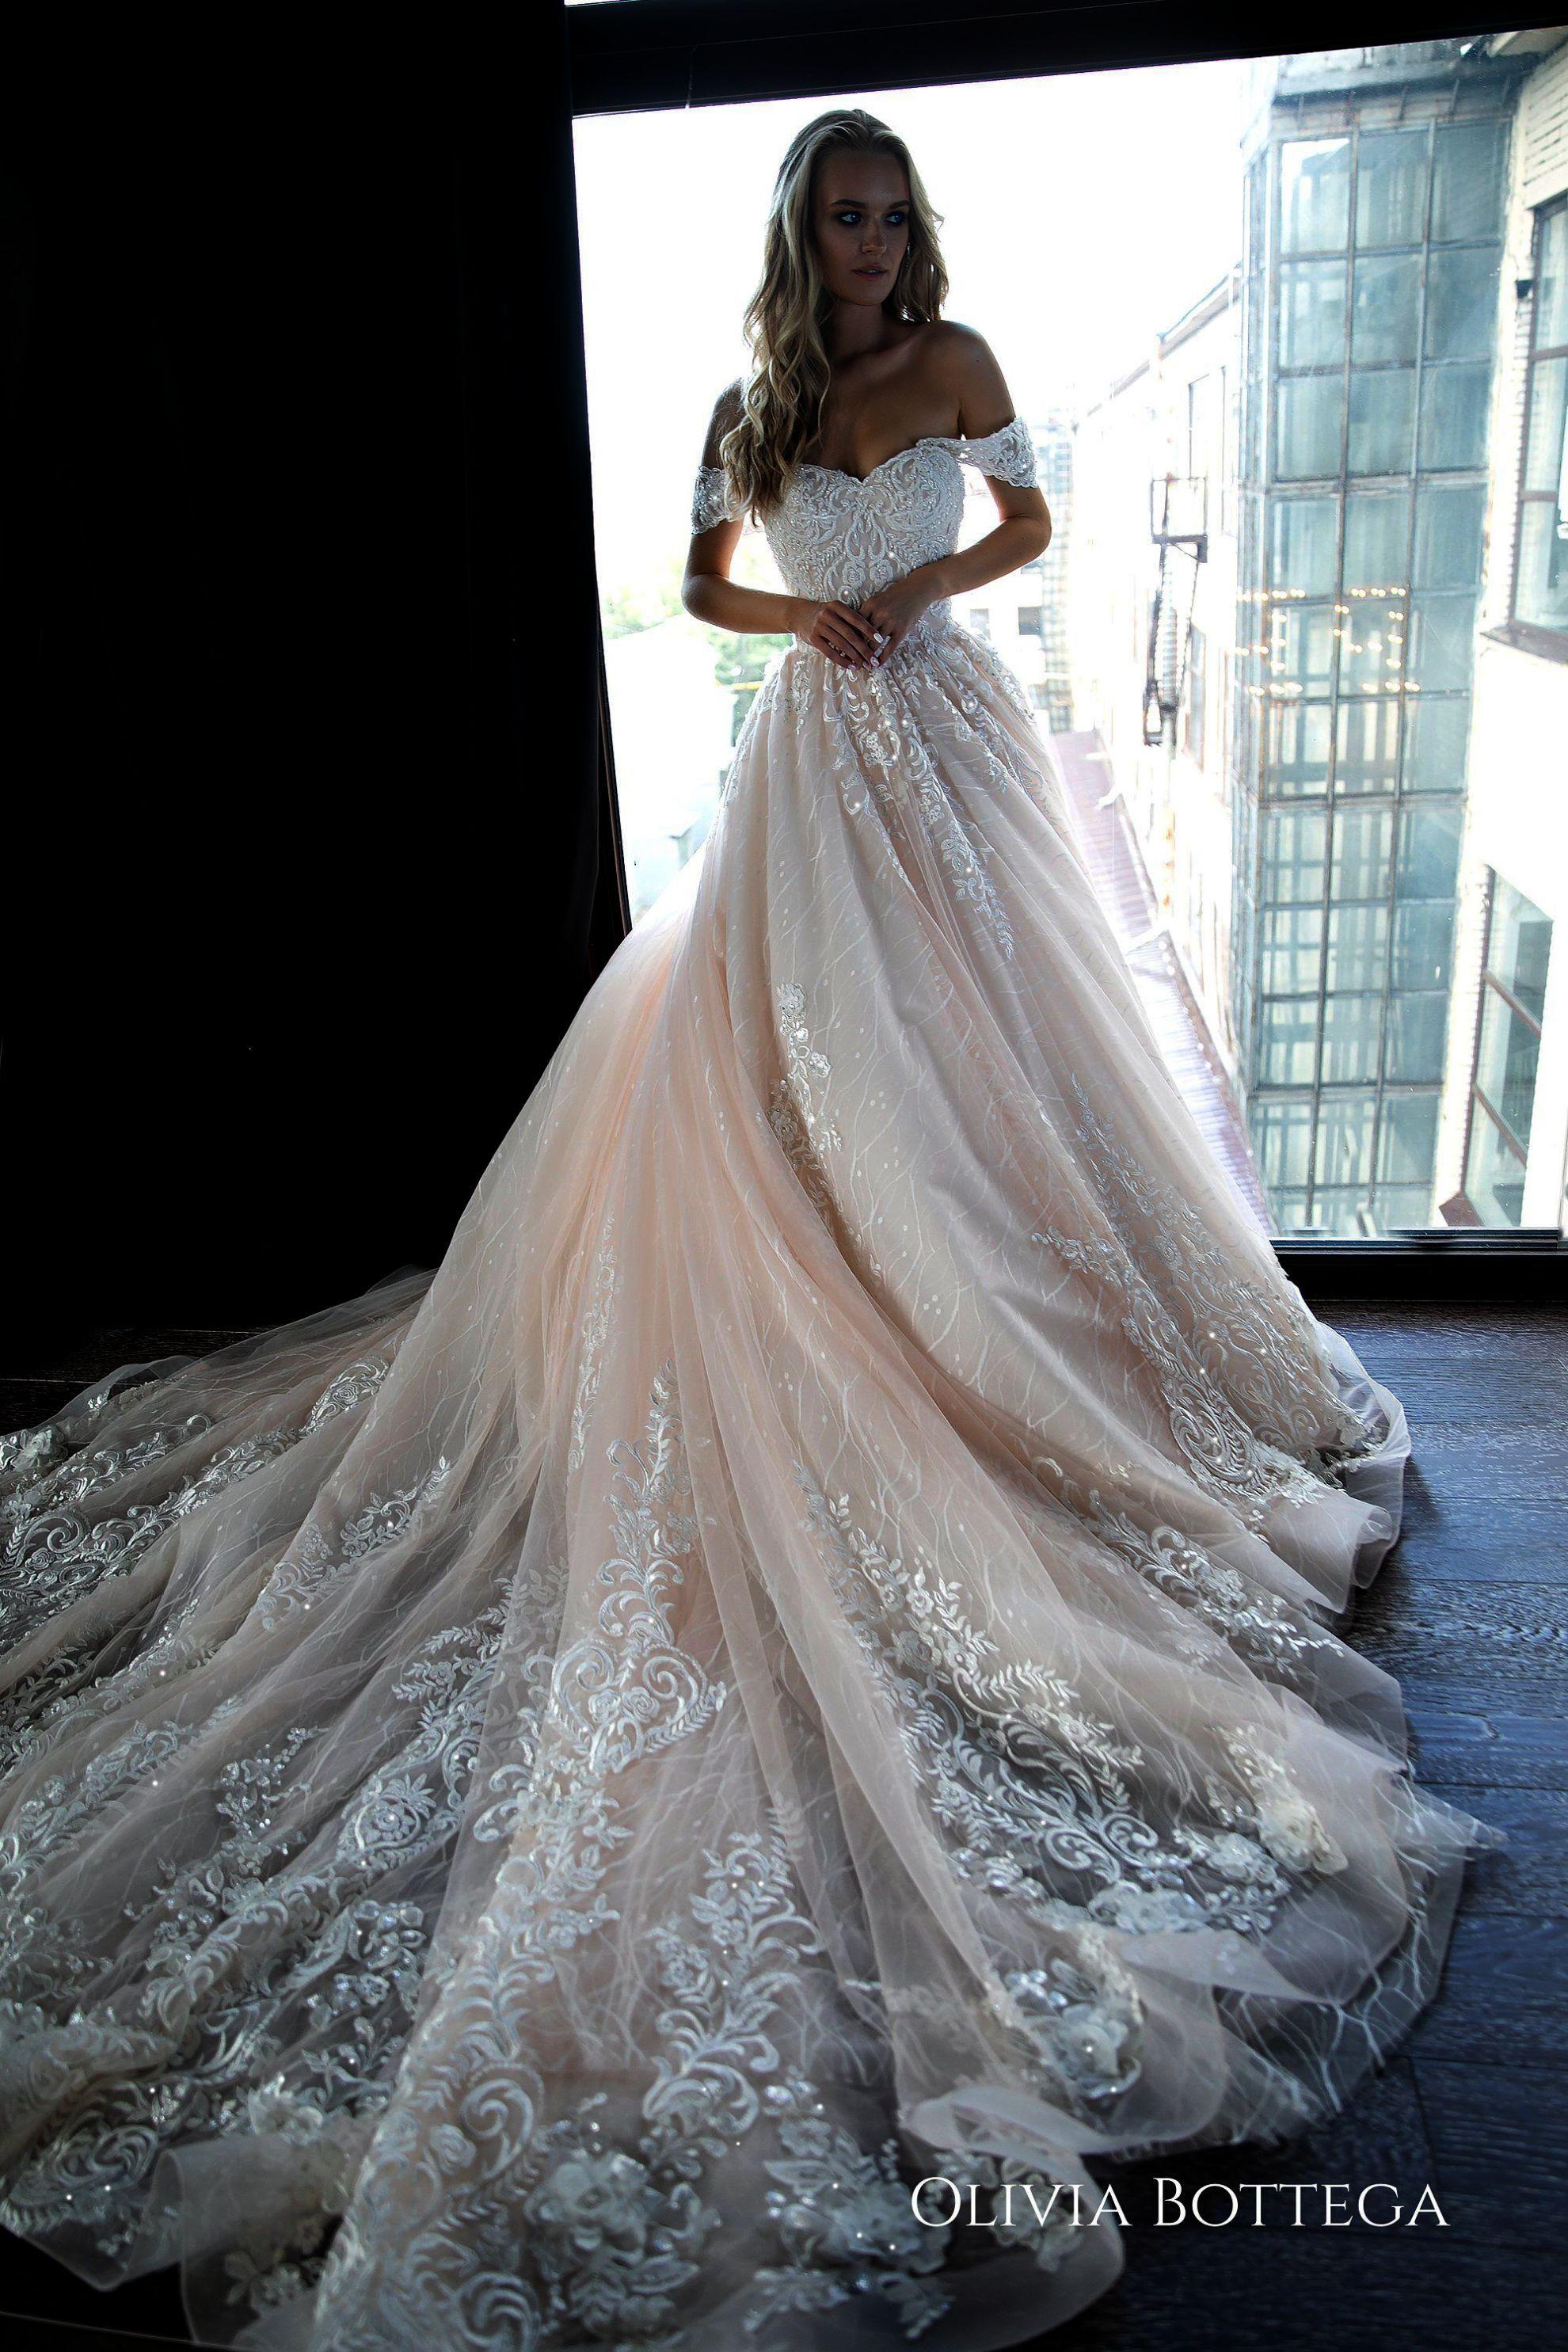 Weddings Dresses Australia Plus Wedding Venues Knoxville Tn These Wedding Rings Right Princess Wedding Dresses Off Shoulder Wedding Dress Dream Wedding Dresses